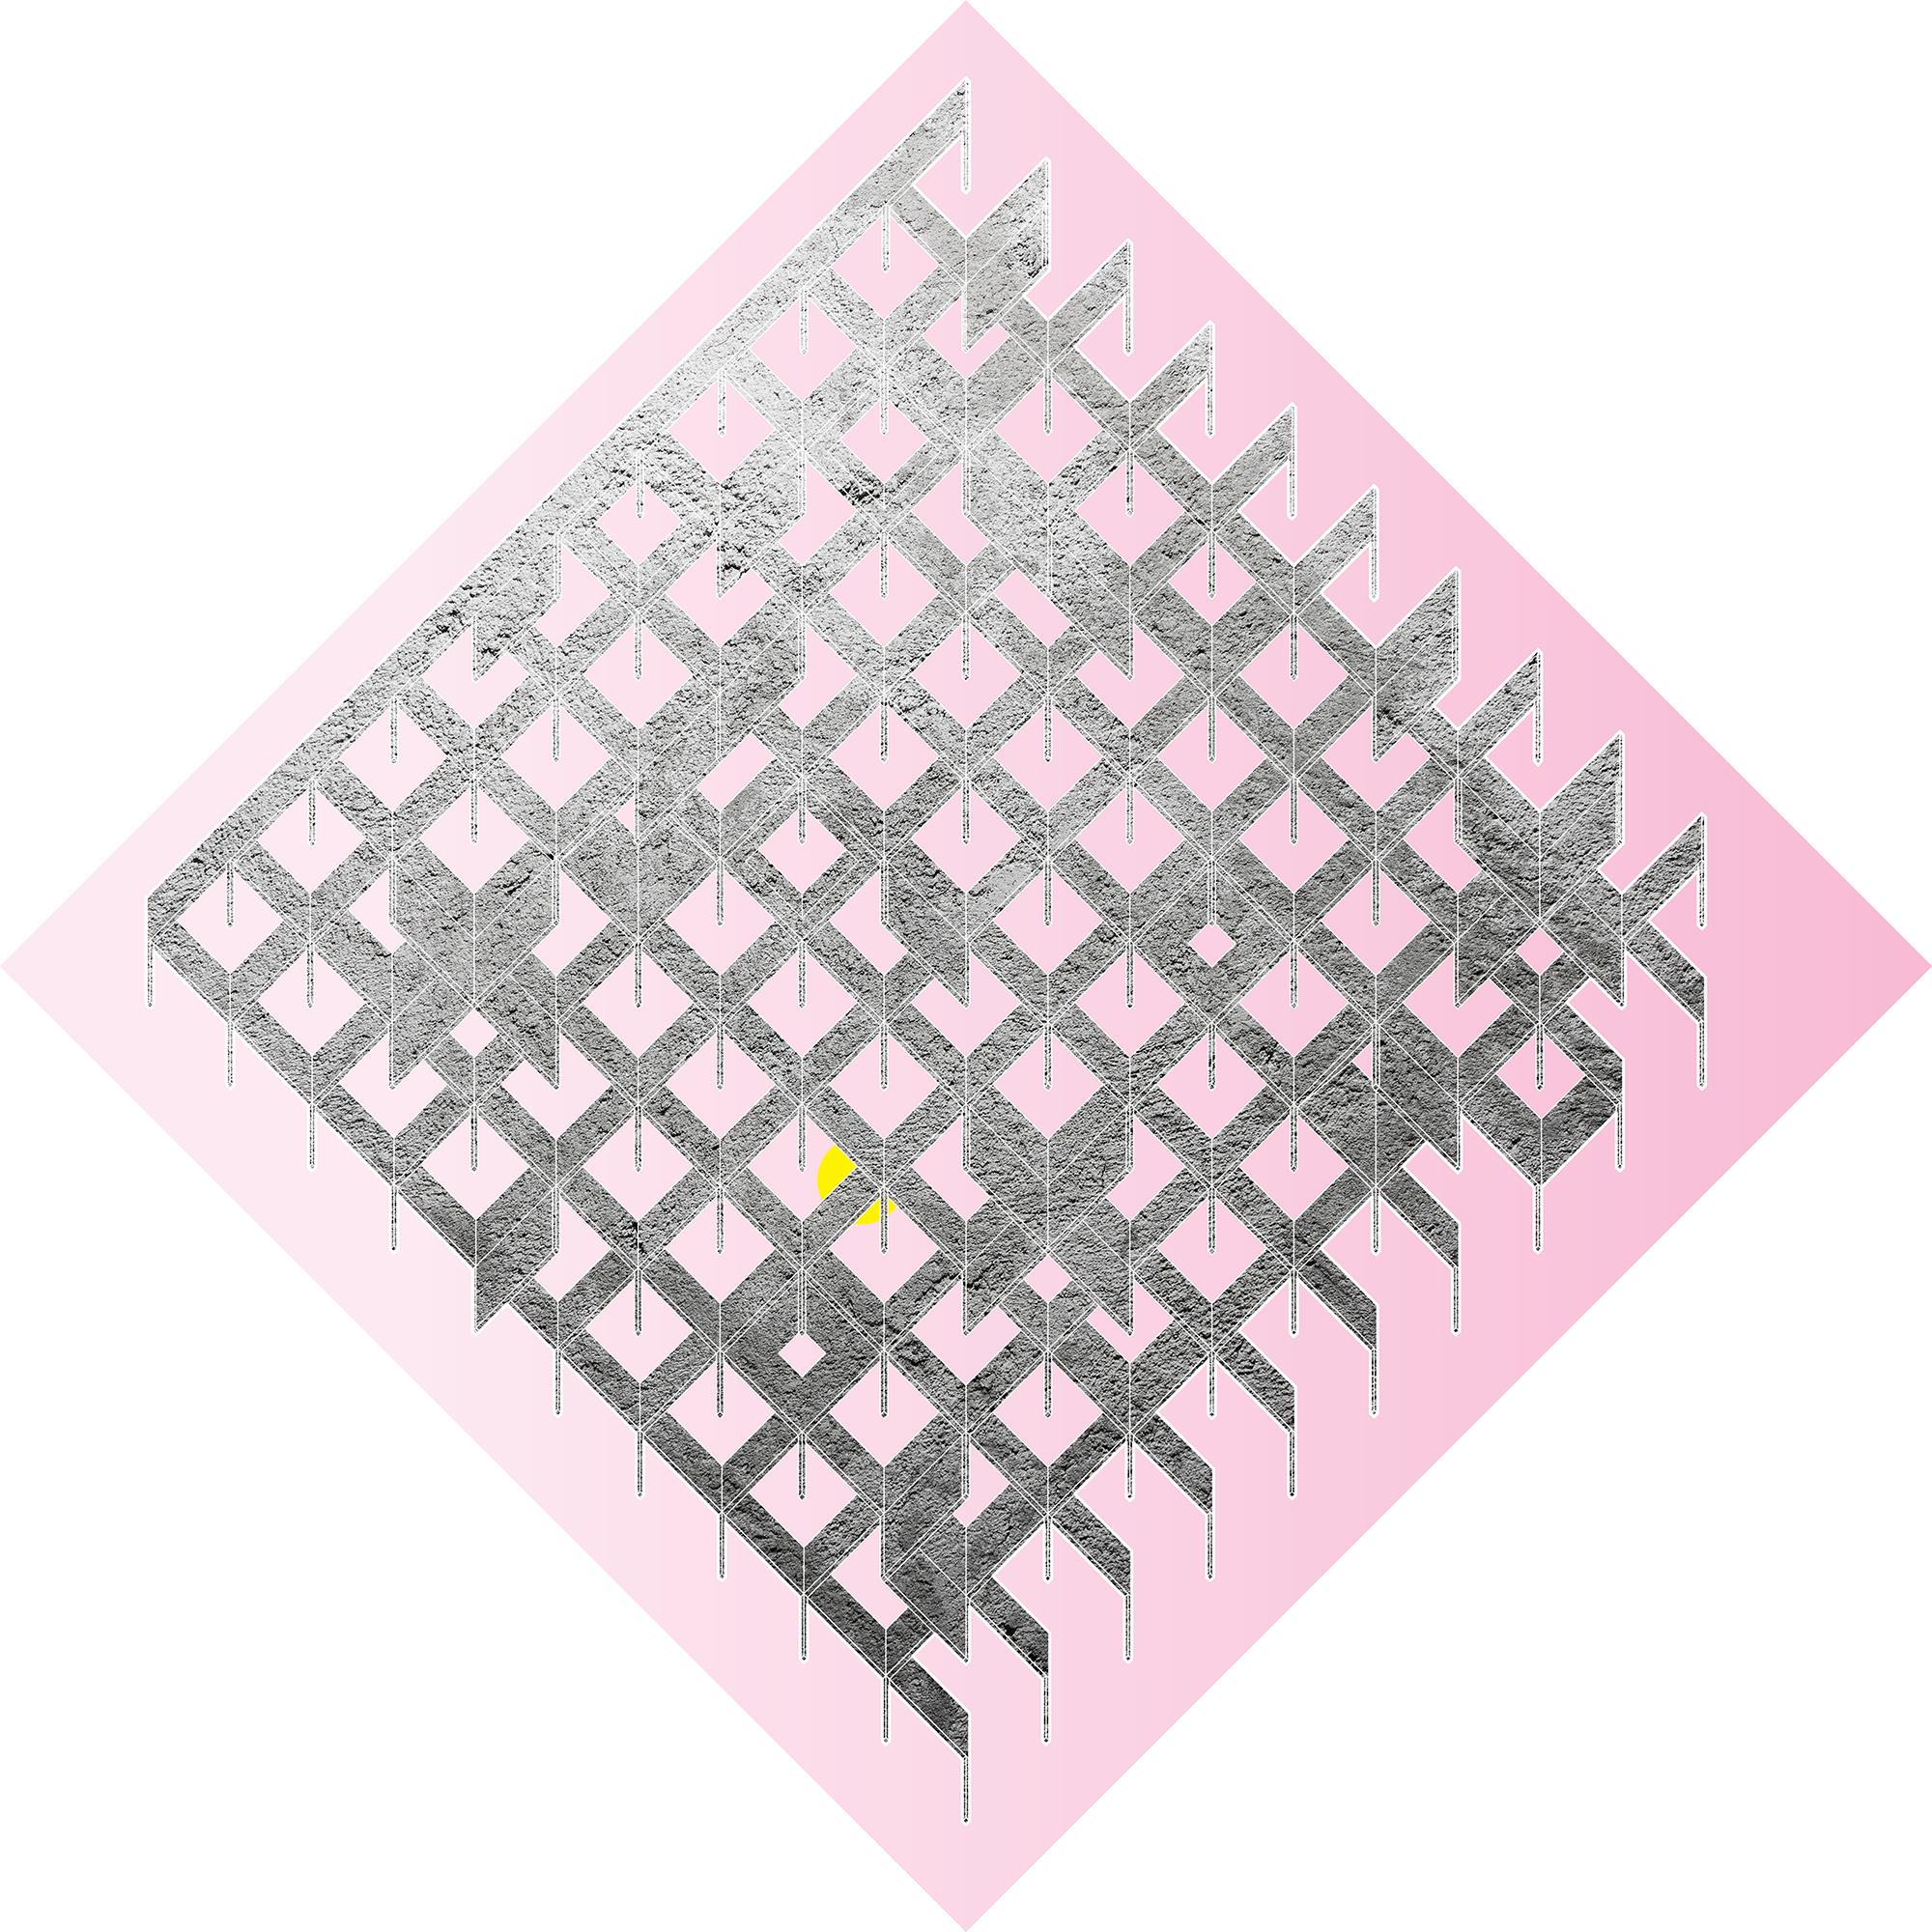 Axon-01 LowRes.jpg